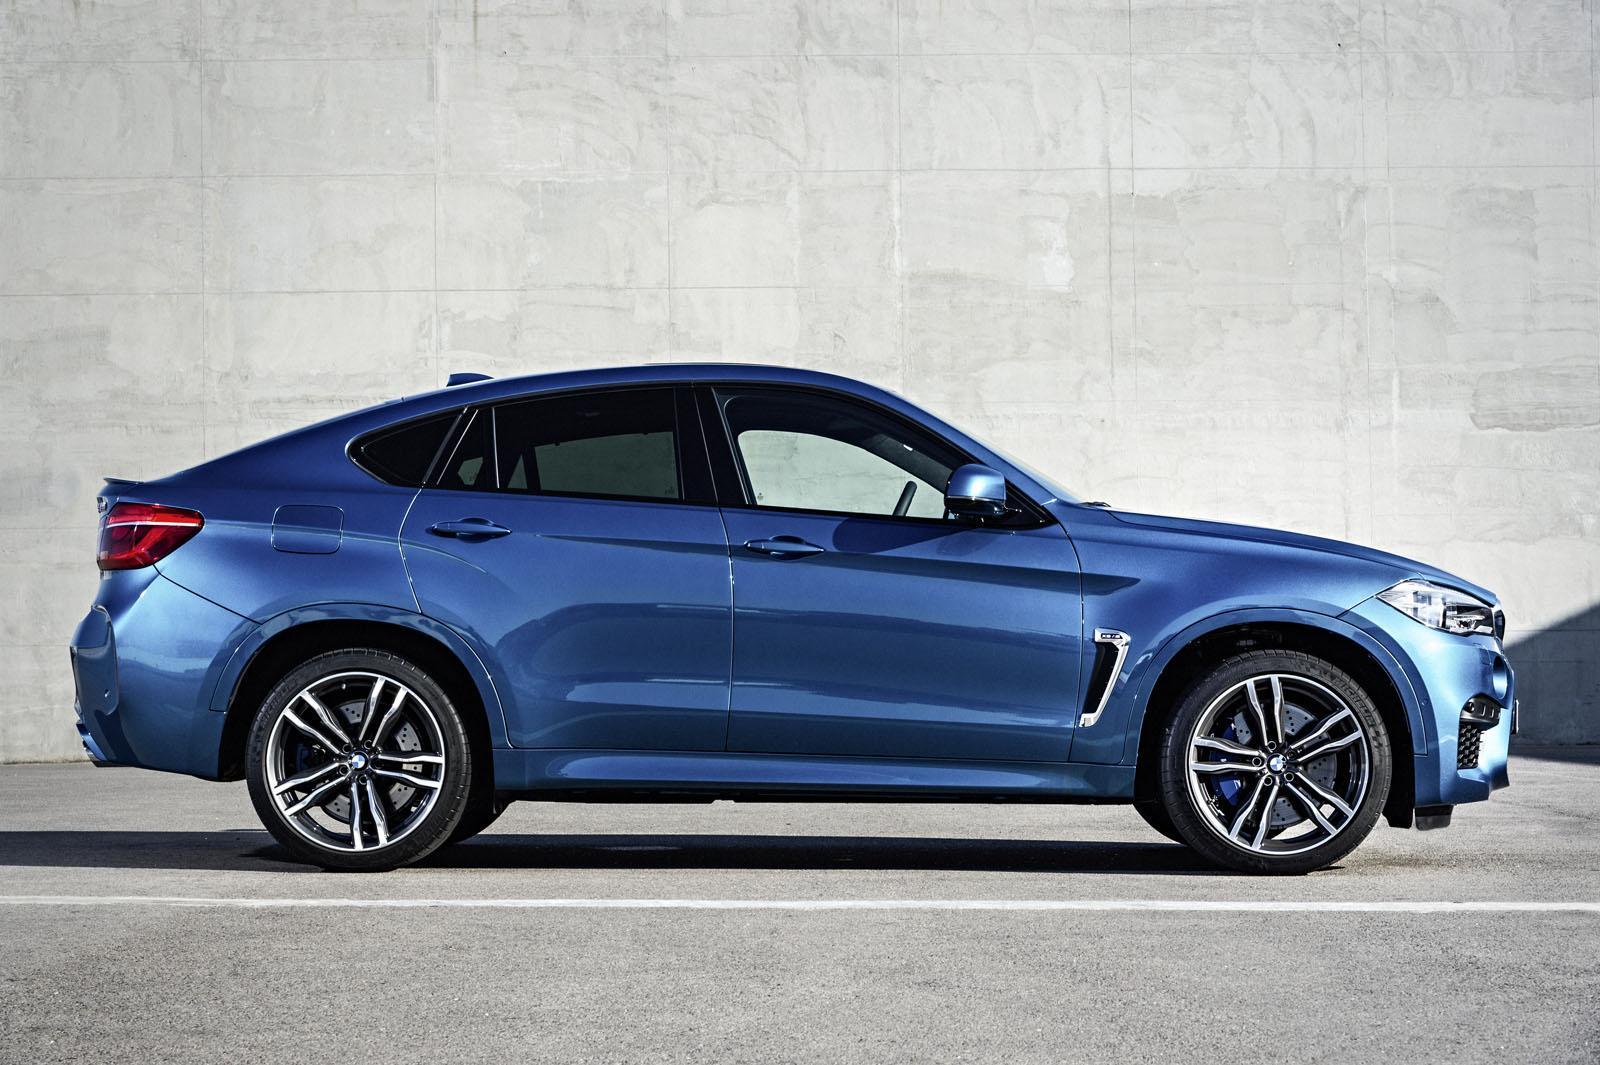 2015 BMW X6 M side